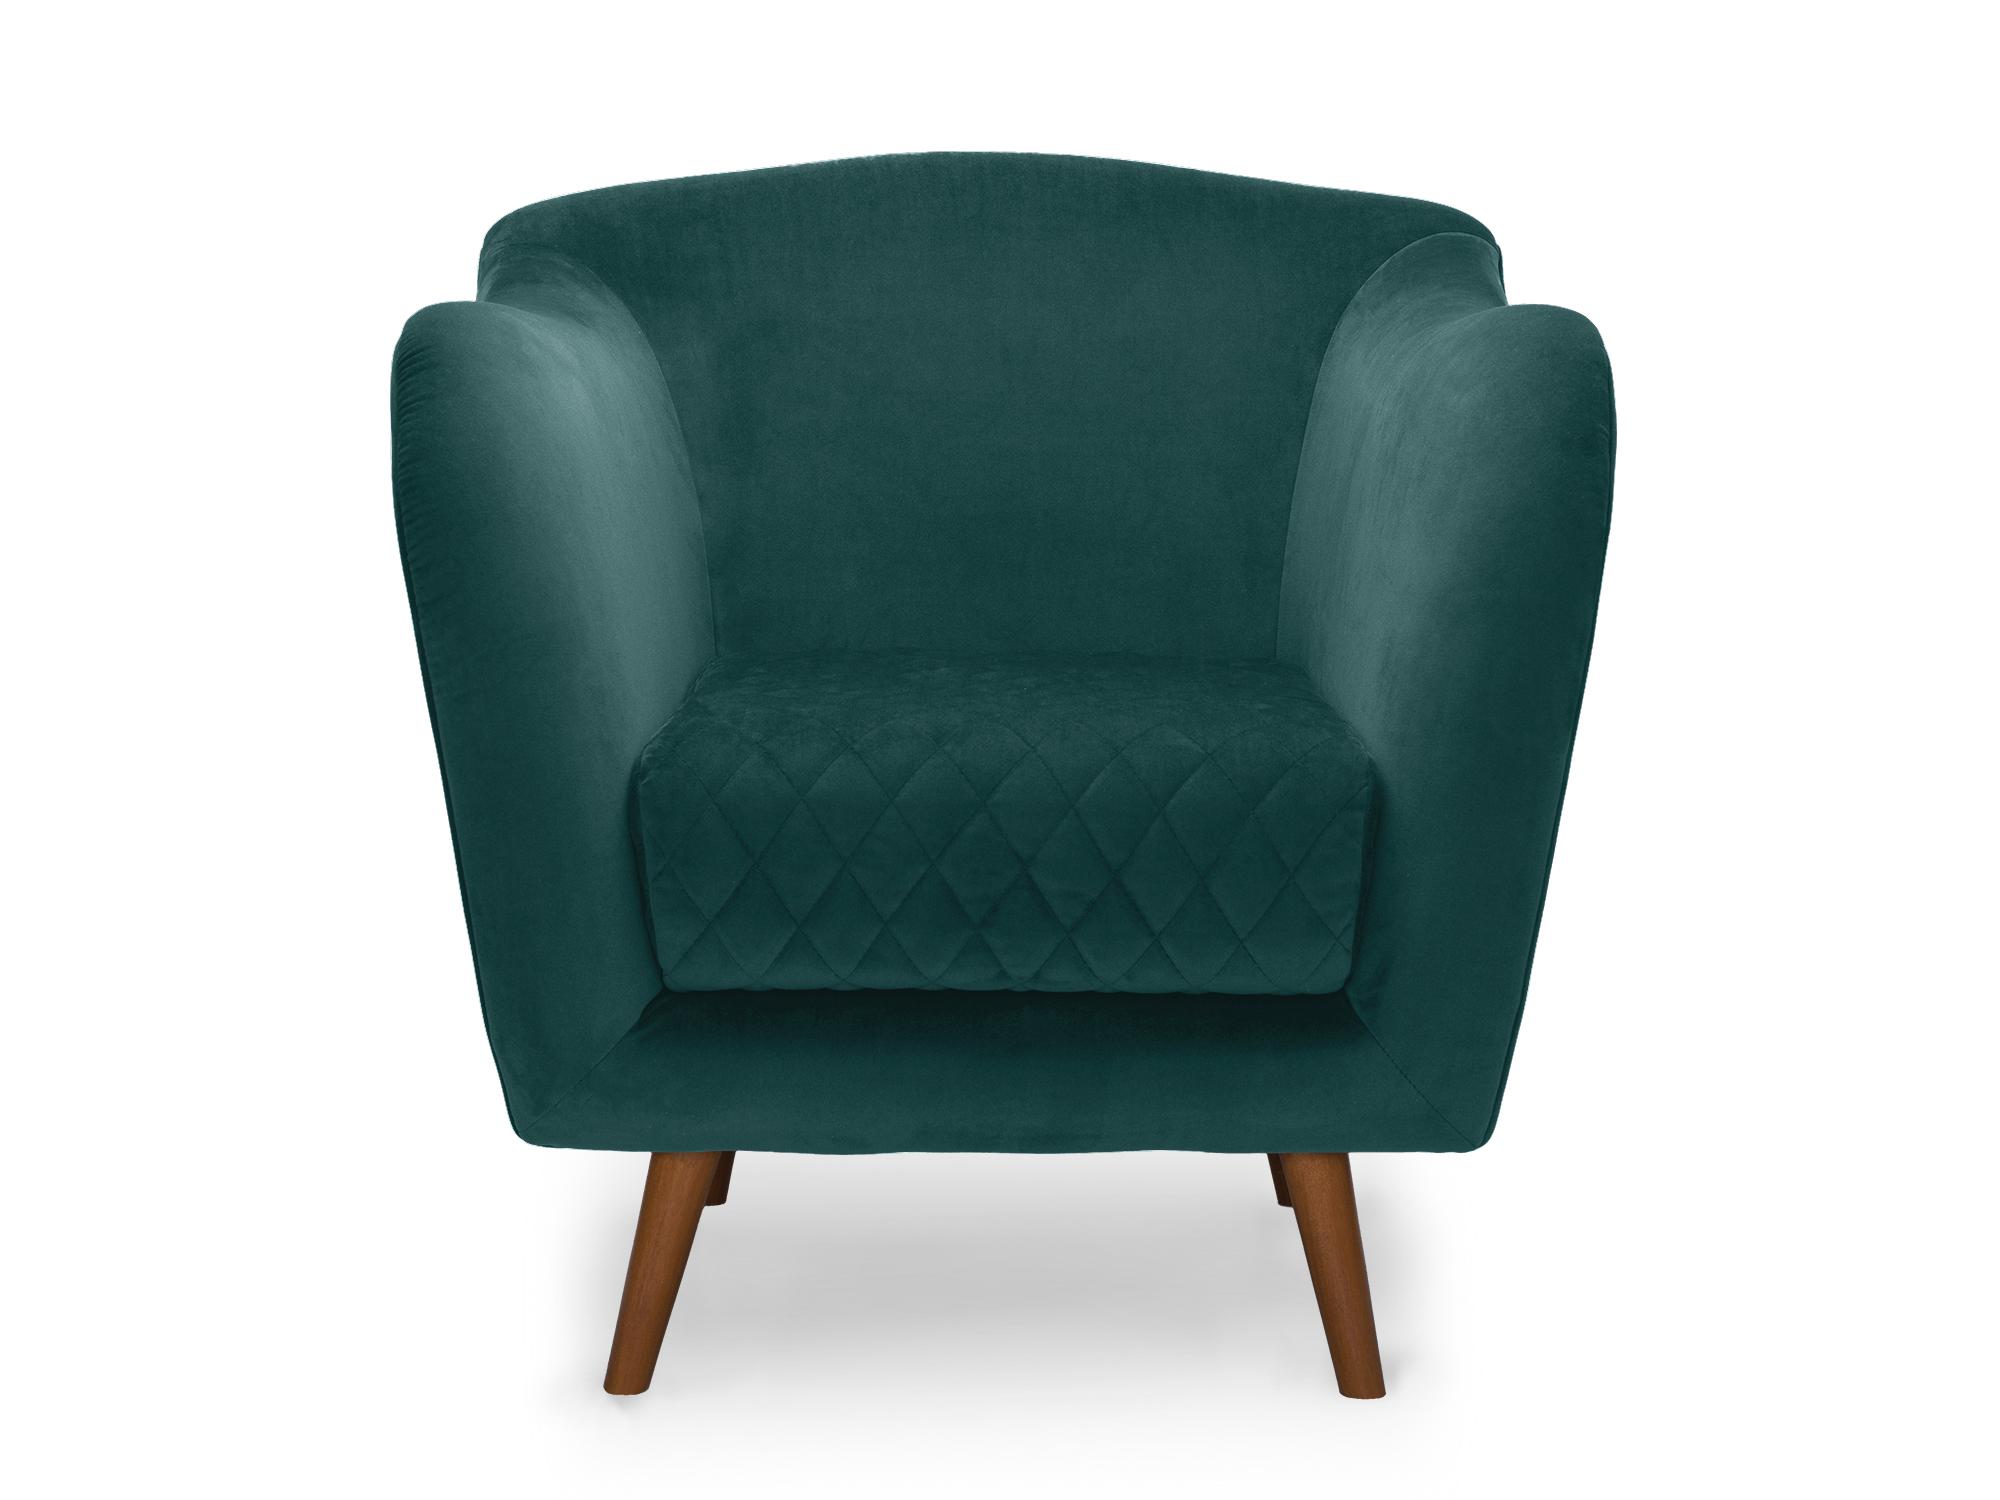 Кресло MyFurnish 15448455 от thefurnish